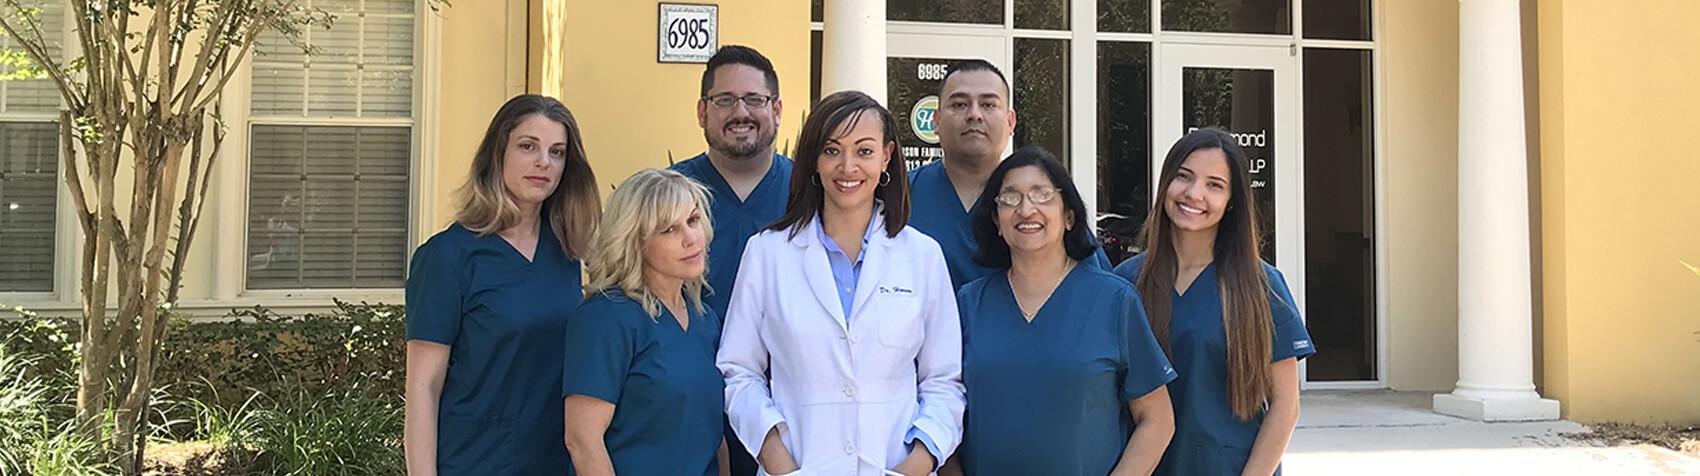 Henson Family Dental team photo